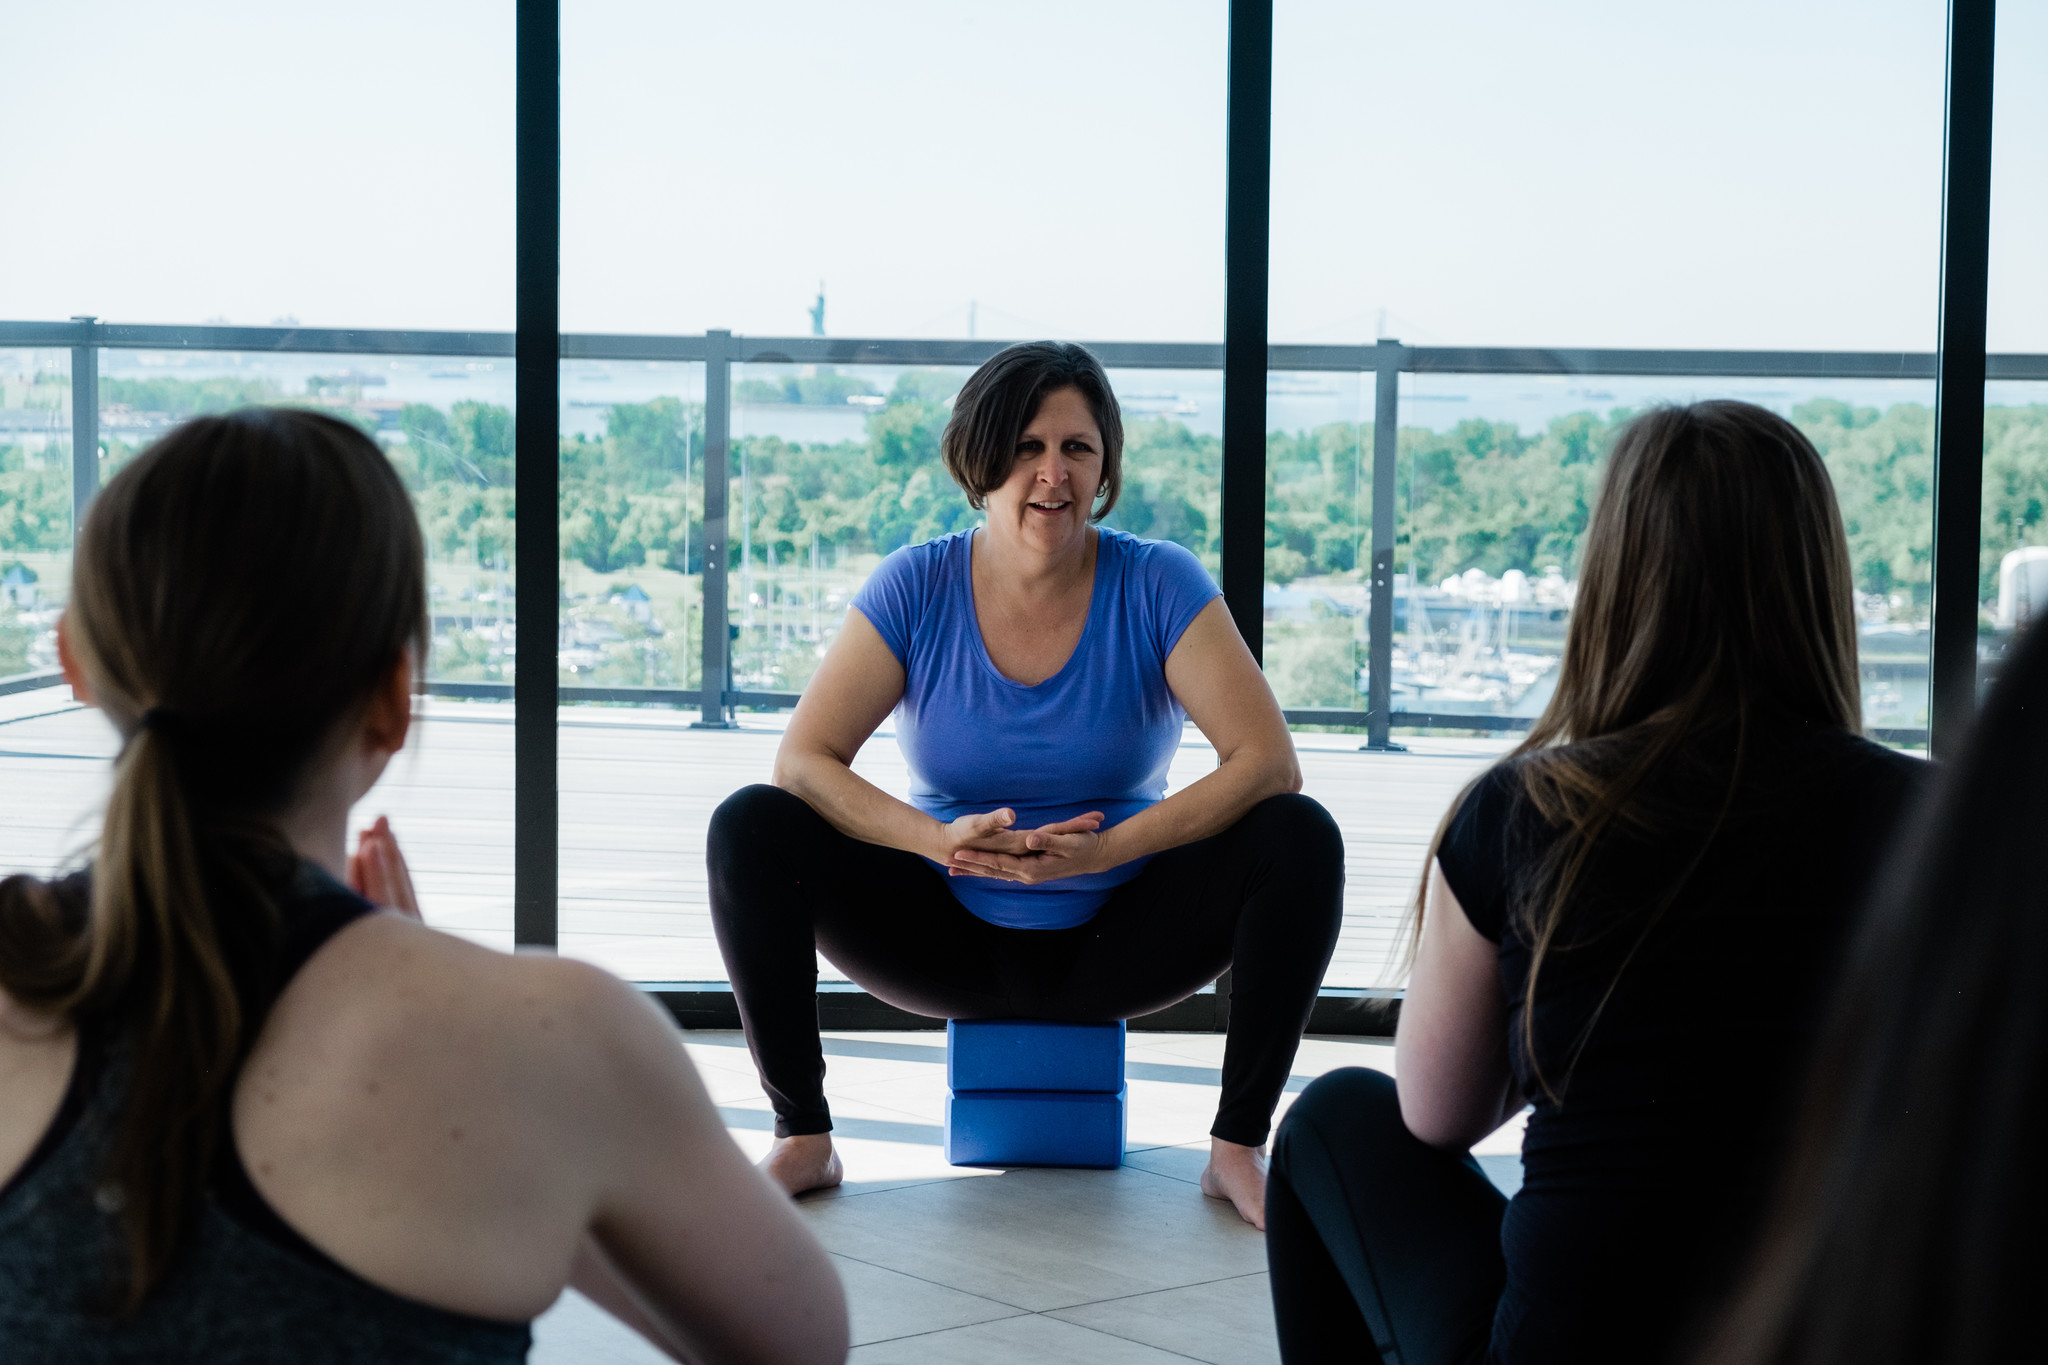 Postpartum support group prenatal yoga